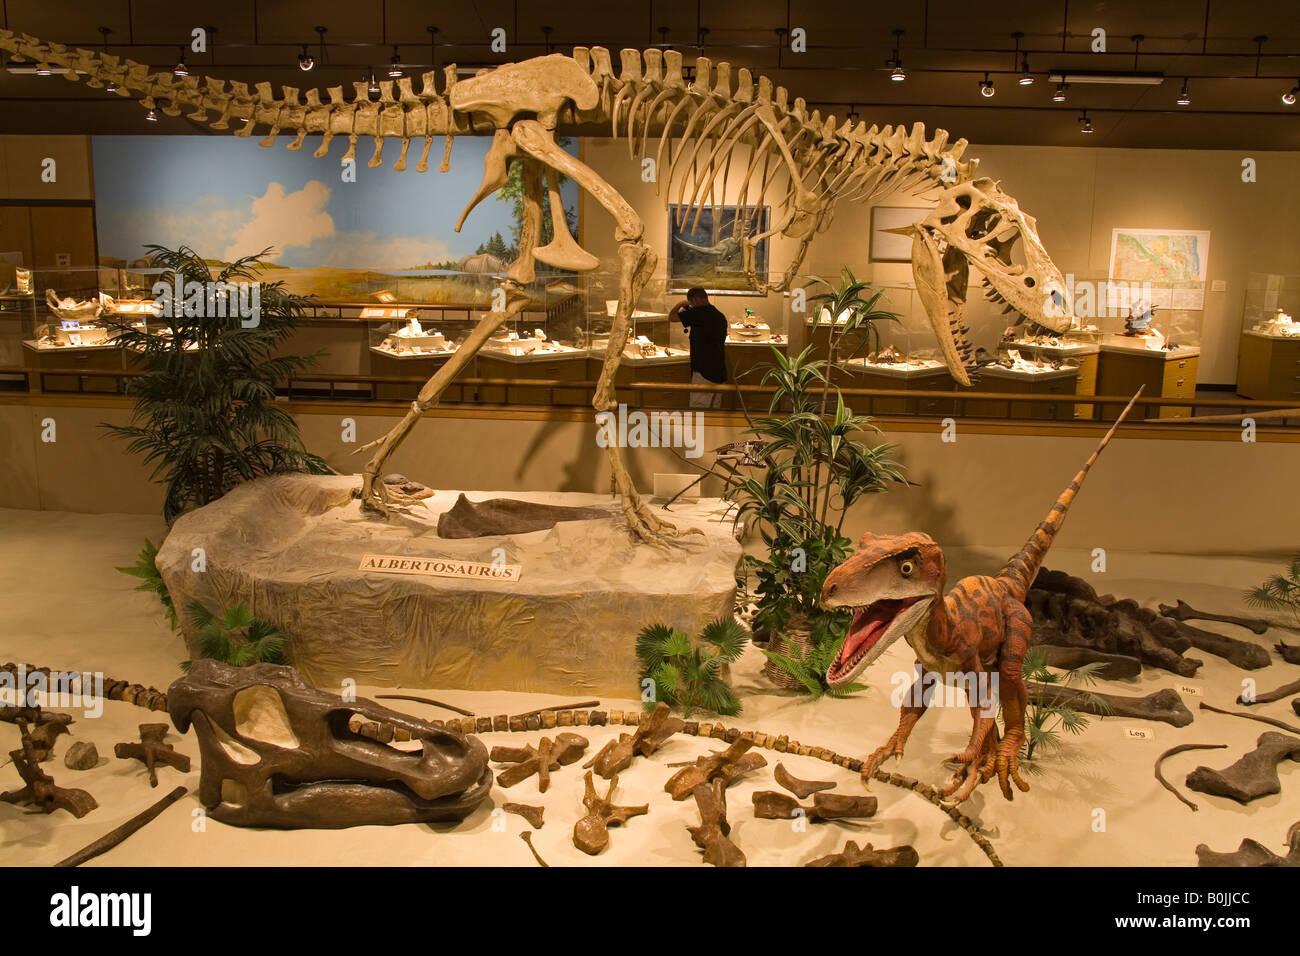 Dakota Dinosaur Museum Dickinson North Dakota USAStock Photo